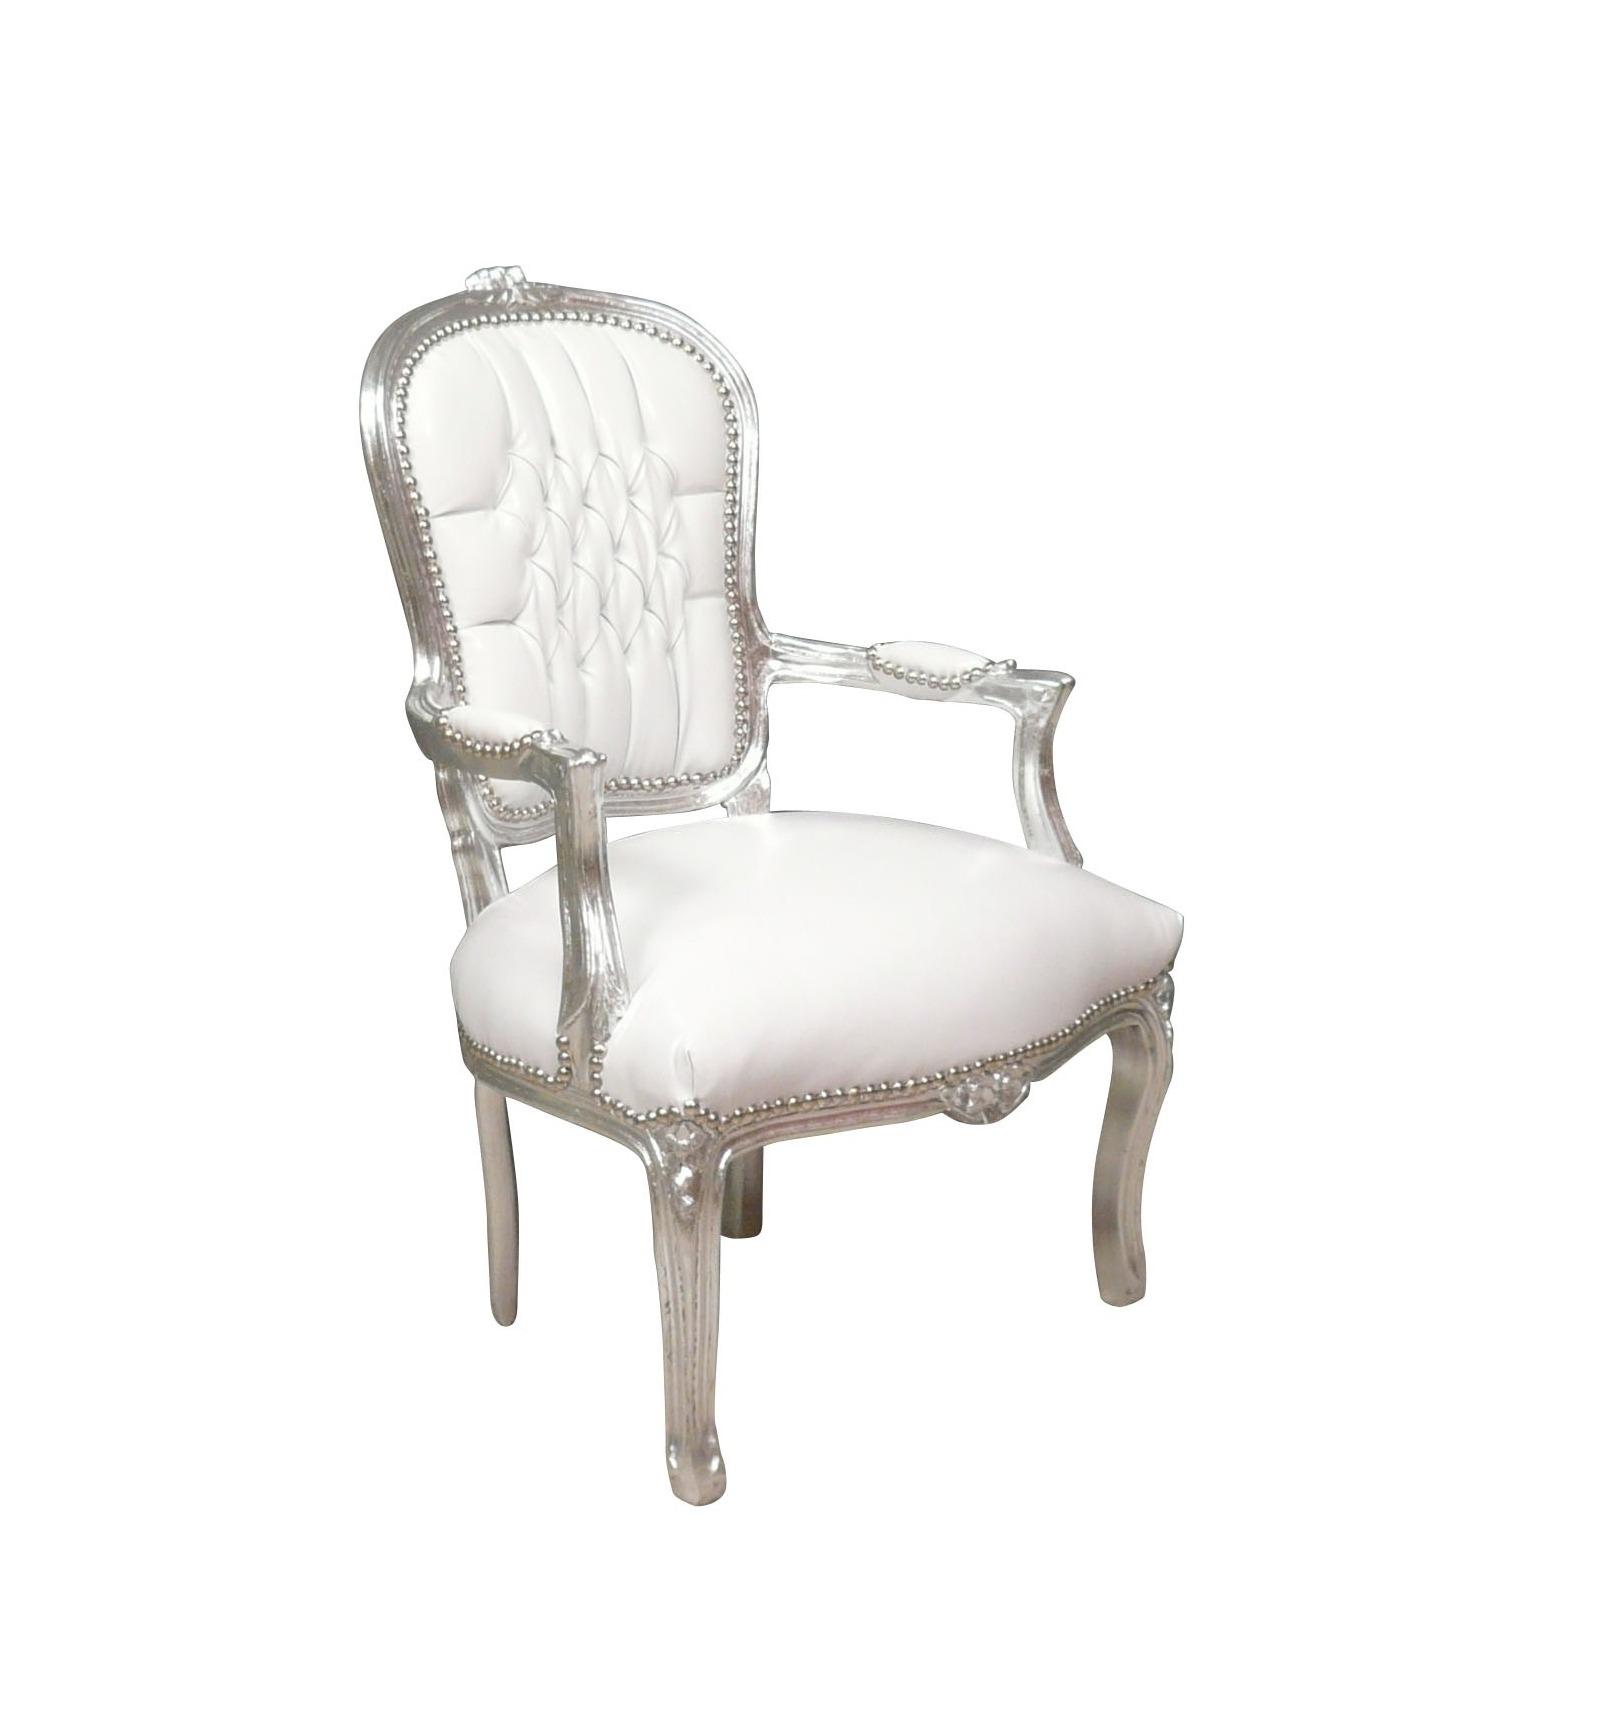 barock sessel louis xv wei und silber stuhl. Black Bedroom Furniture Sets. Home Design Ideas